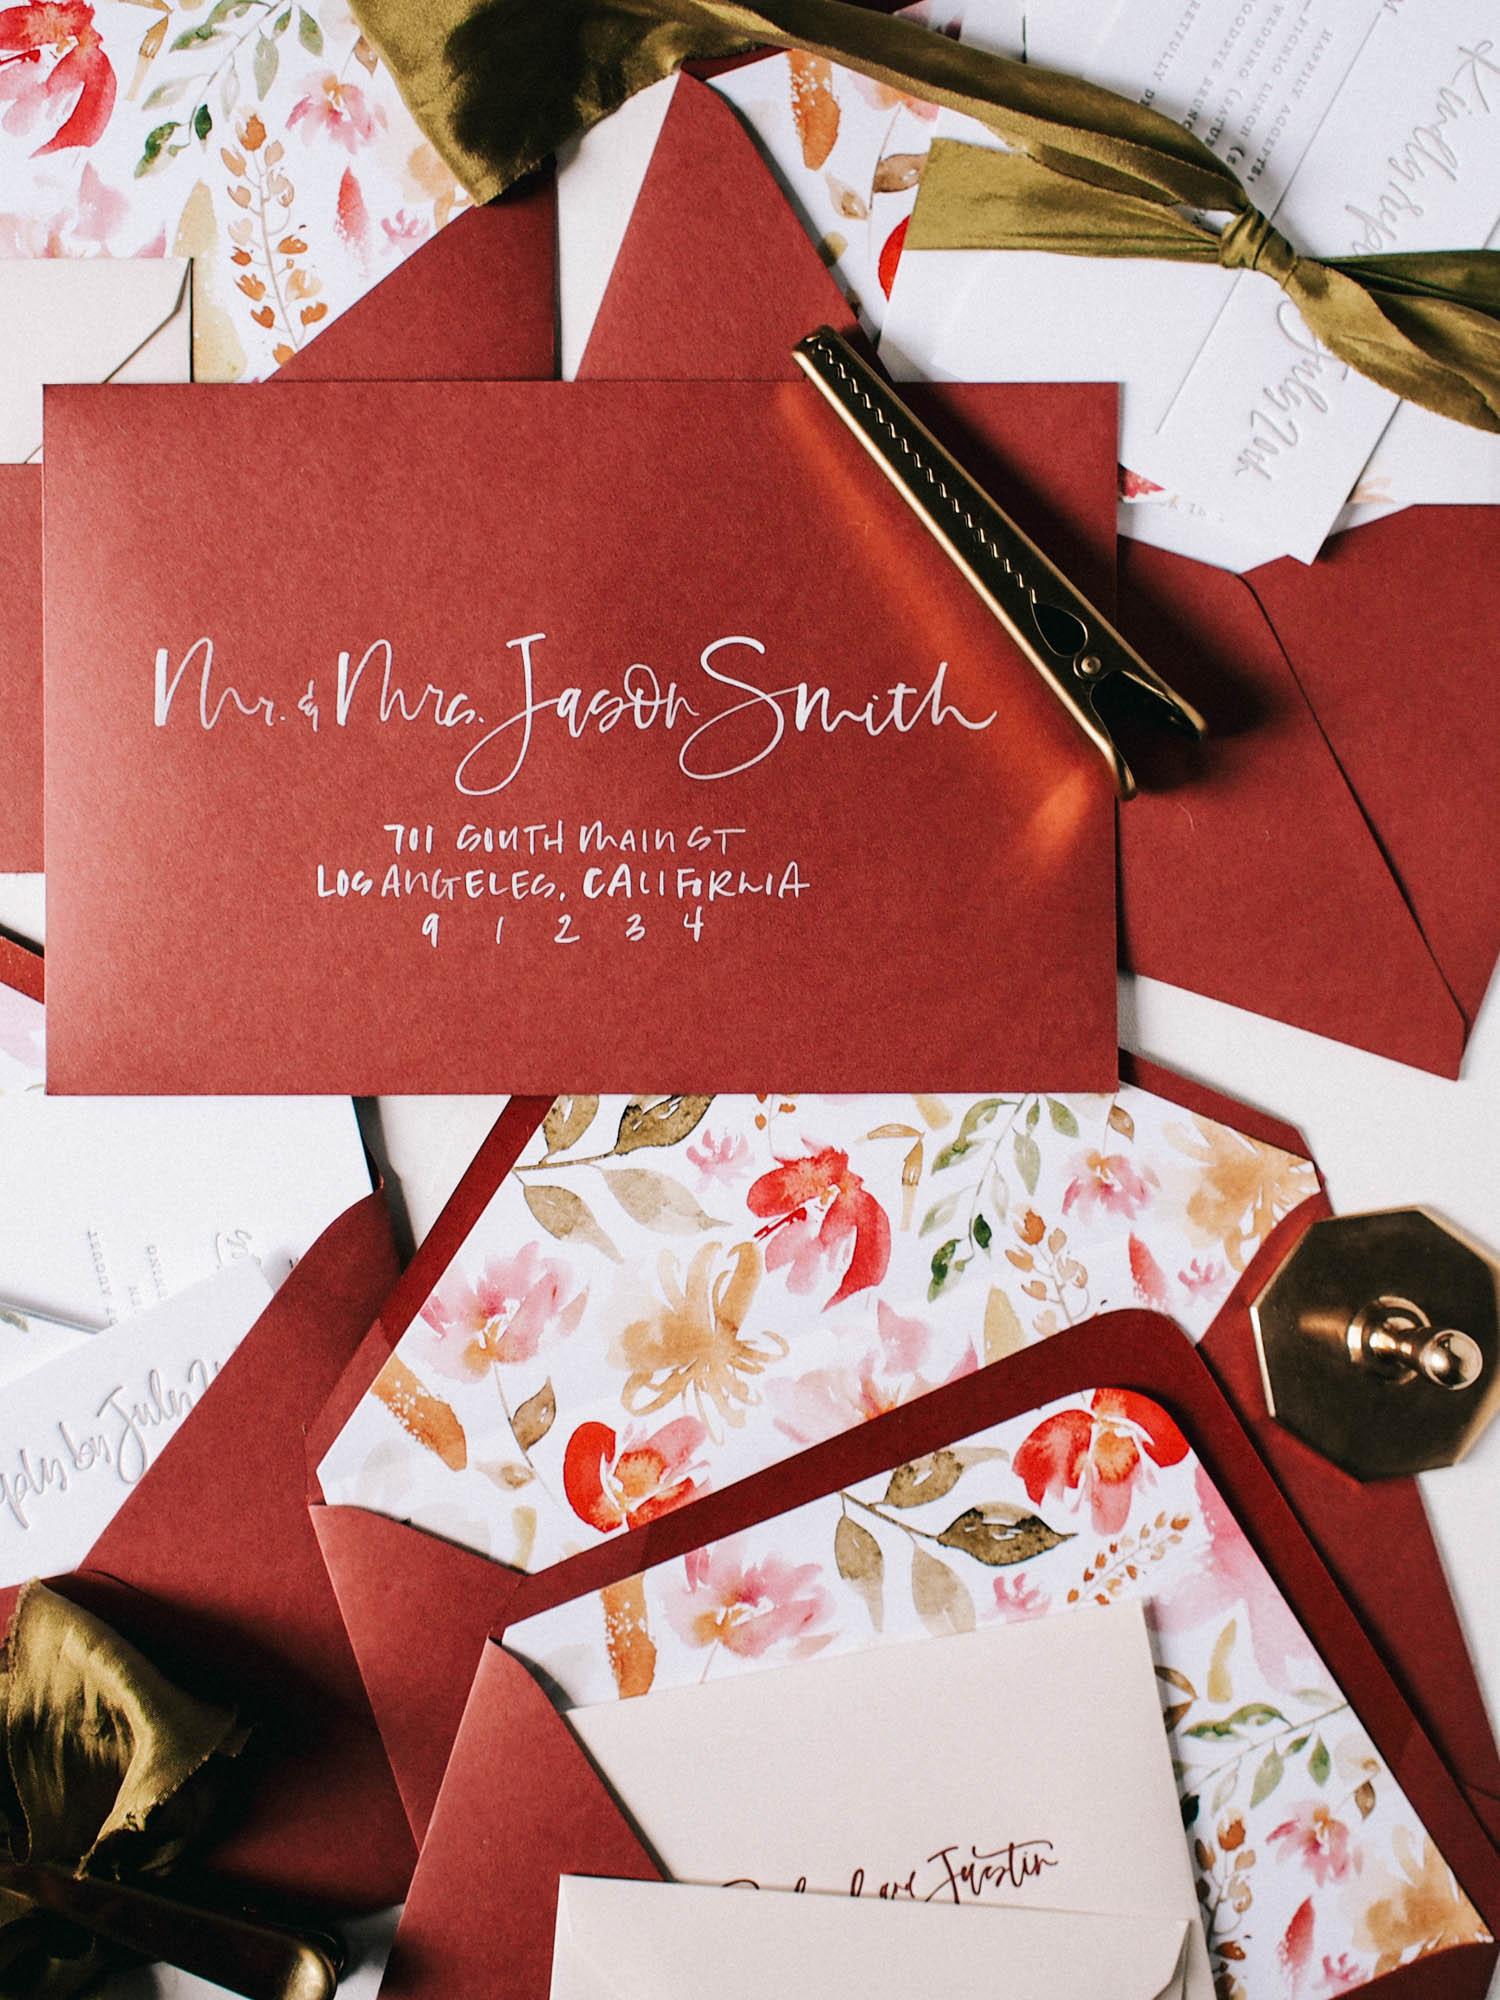 How to letter dark envelopes with white brush lettering | A Fabulous Fete